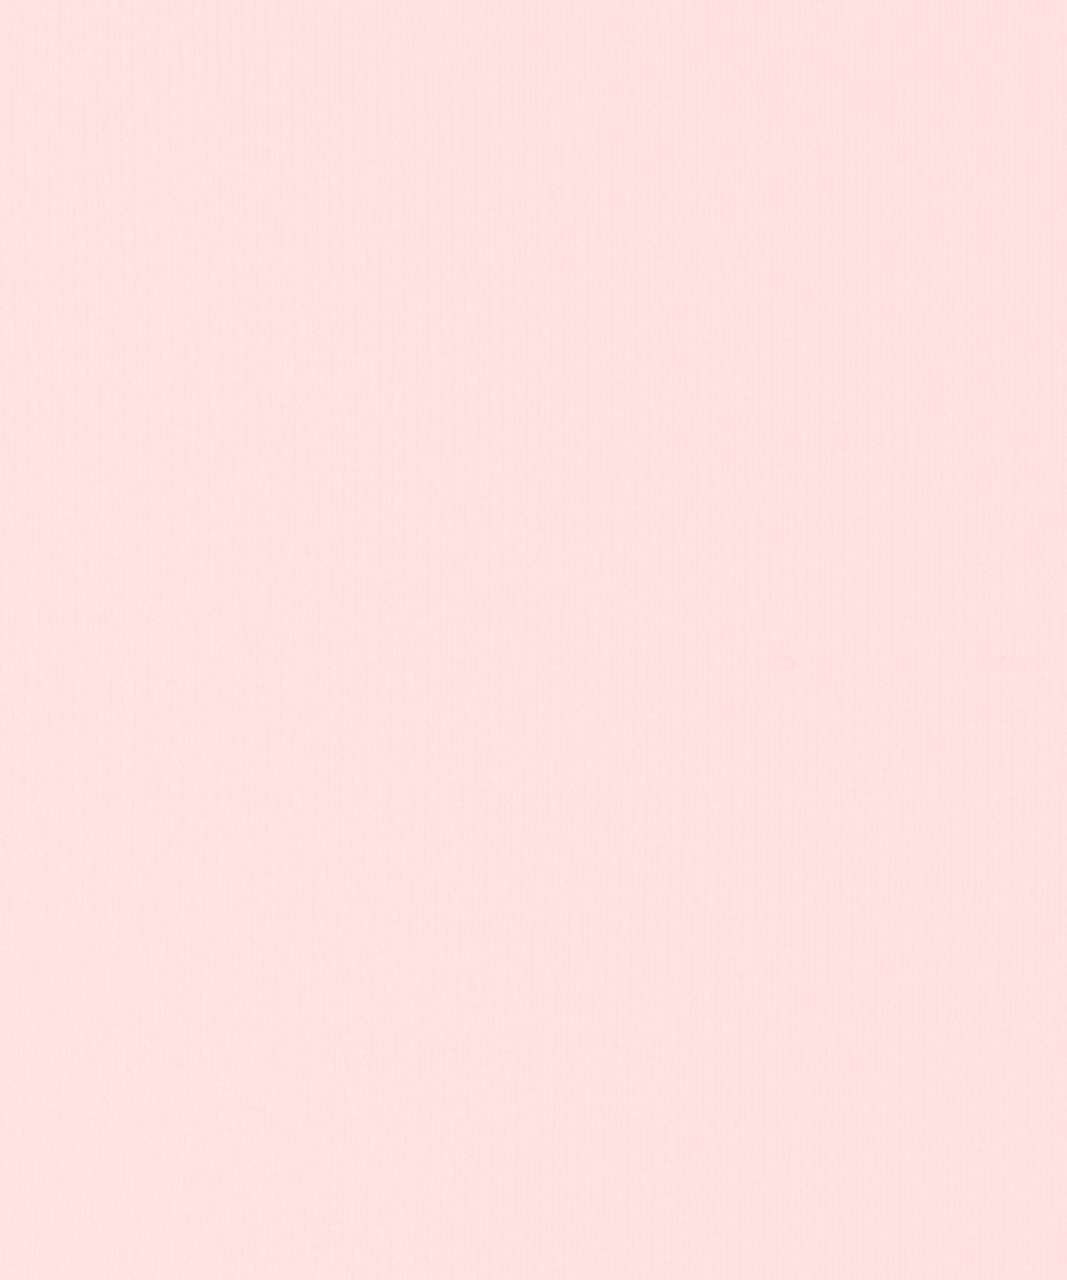 Lululemon Free To Be Moved Bra - Powdered Rose